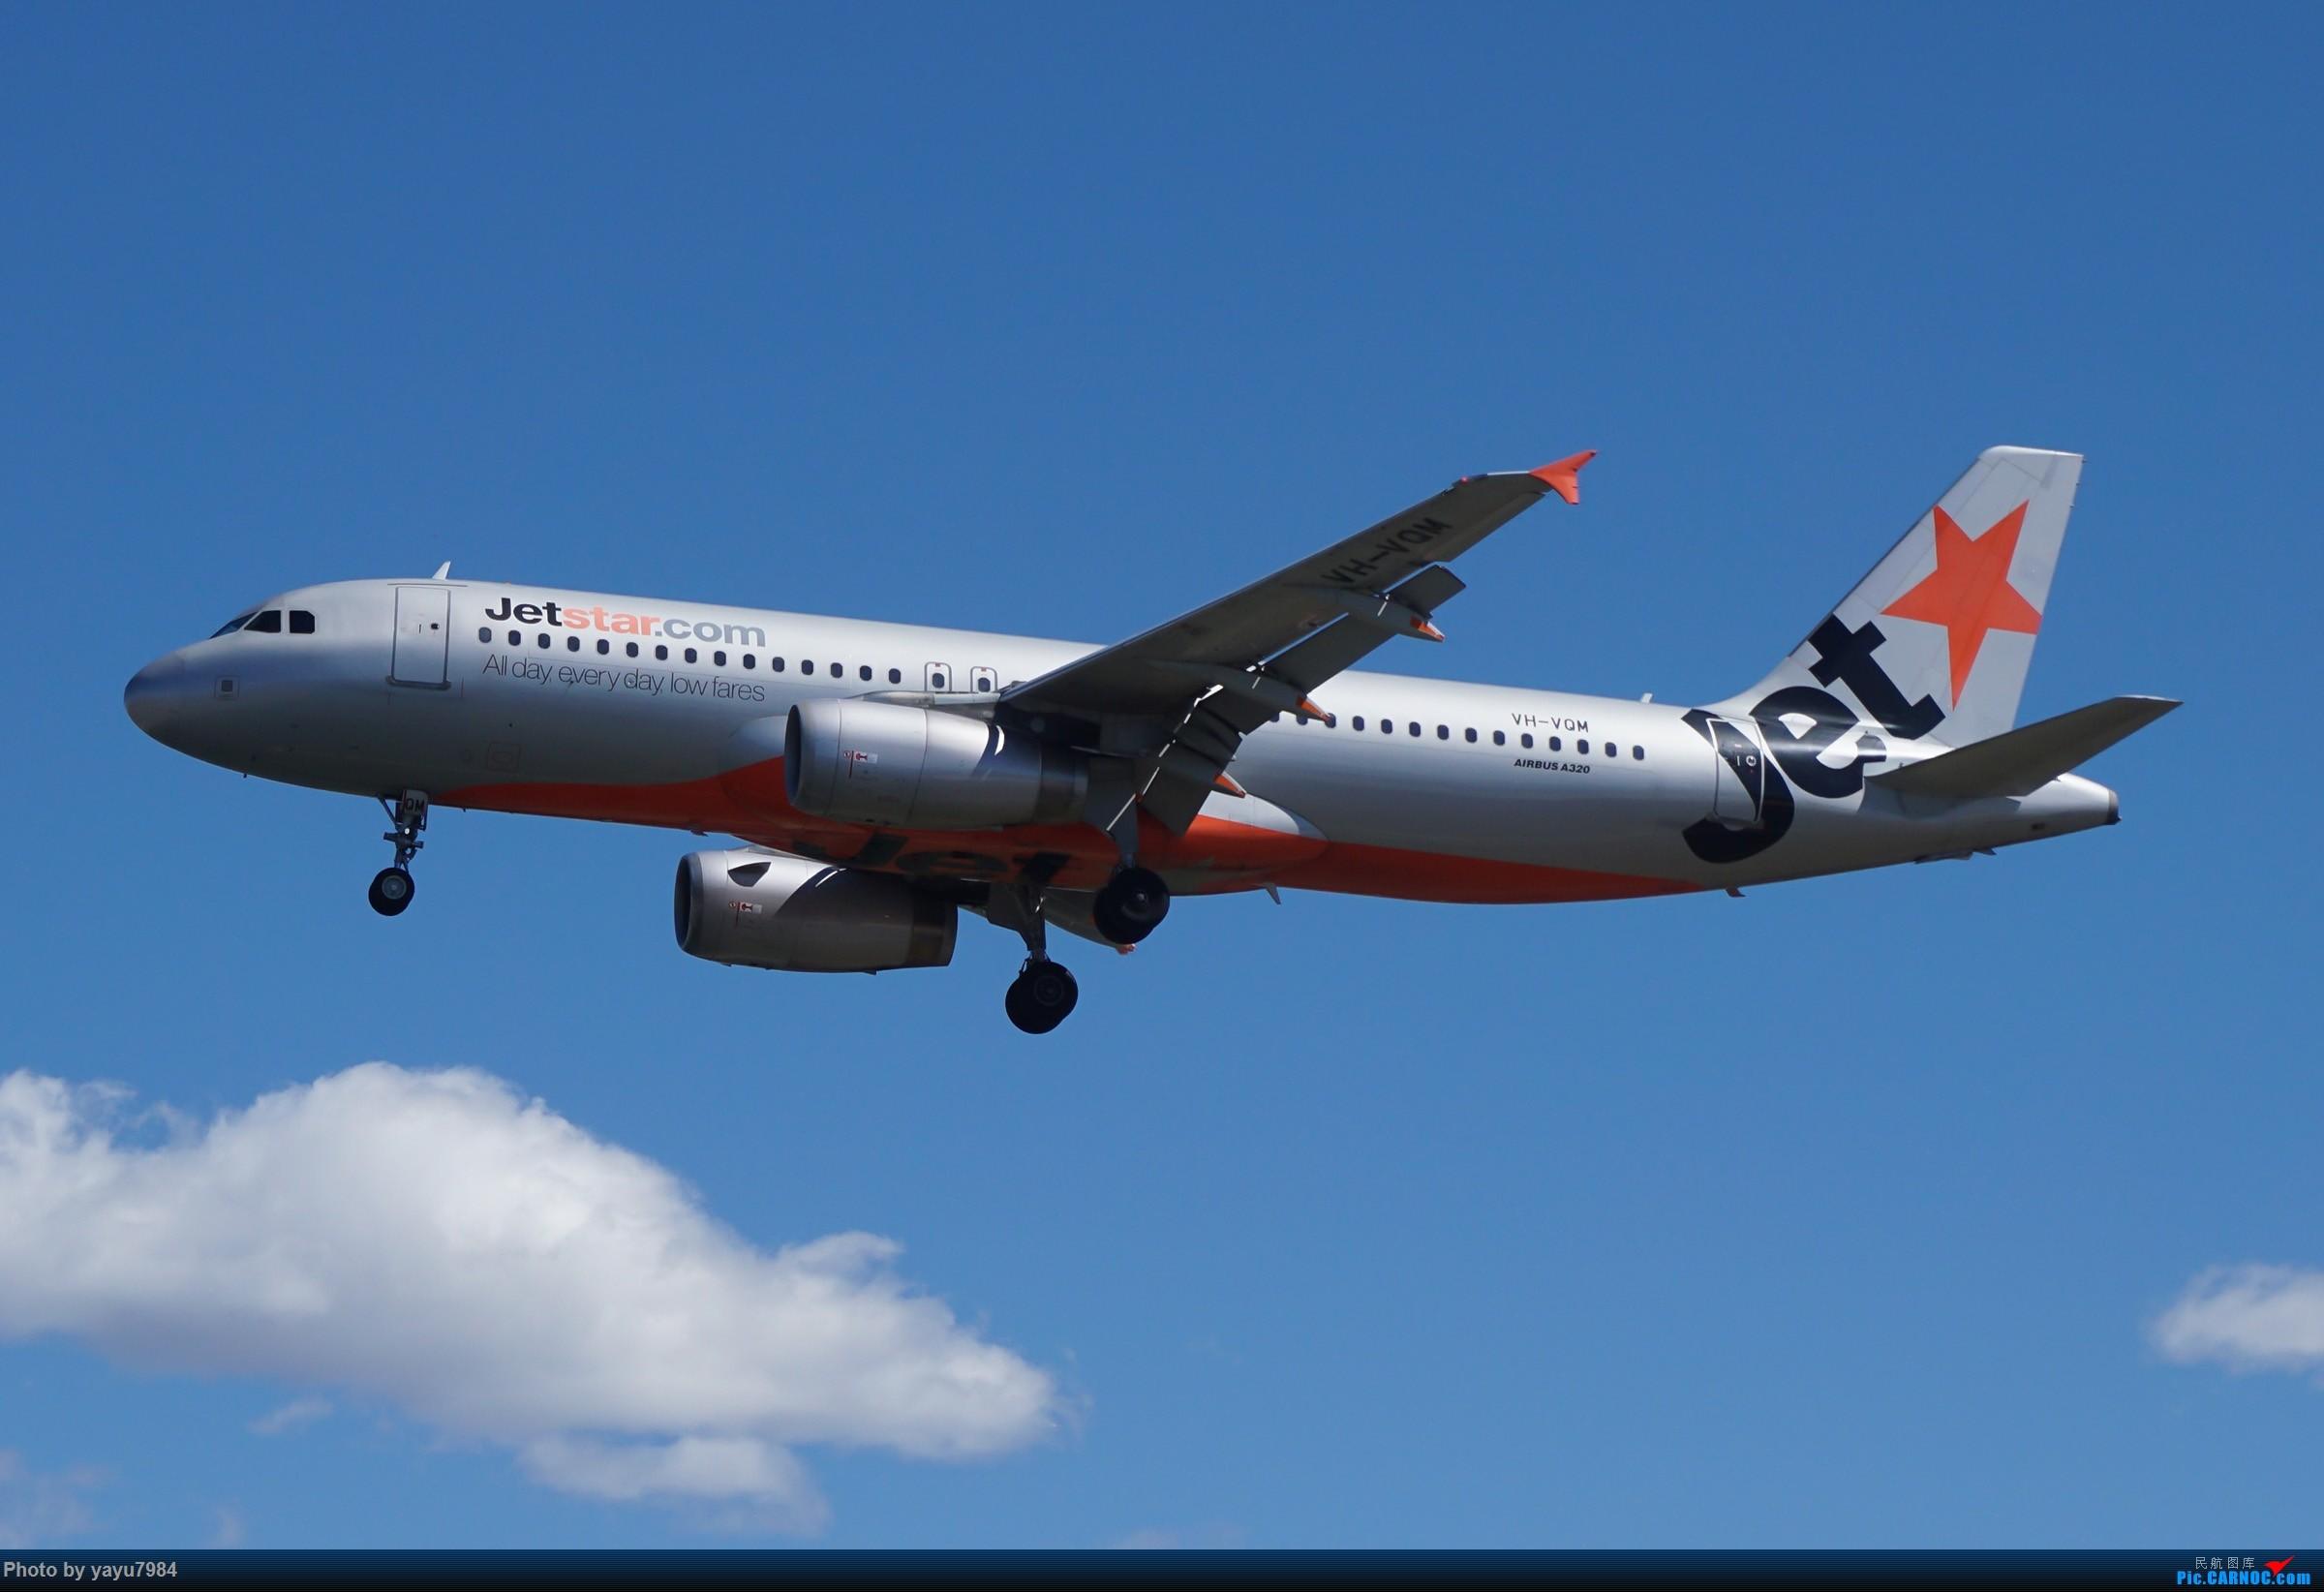 Re:[原创][SYD] 东航天合332,雪绒花343,华航蓝鹊,以及其他日常货 AIRBUS A320-200 VH-VQM 澳大利亚悉尼金斯福德·史密斯机场